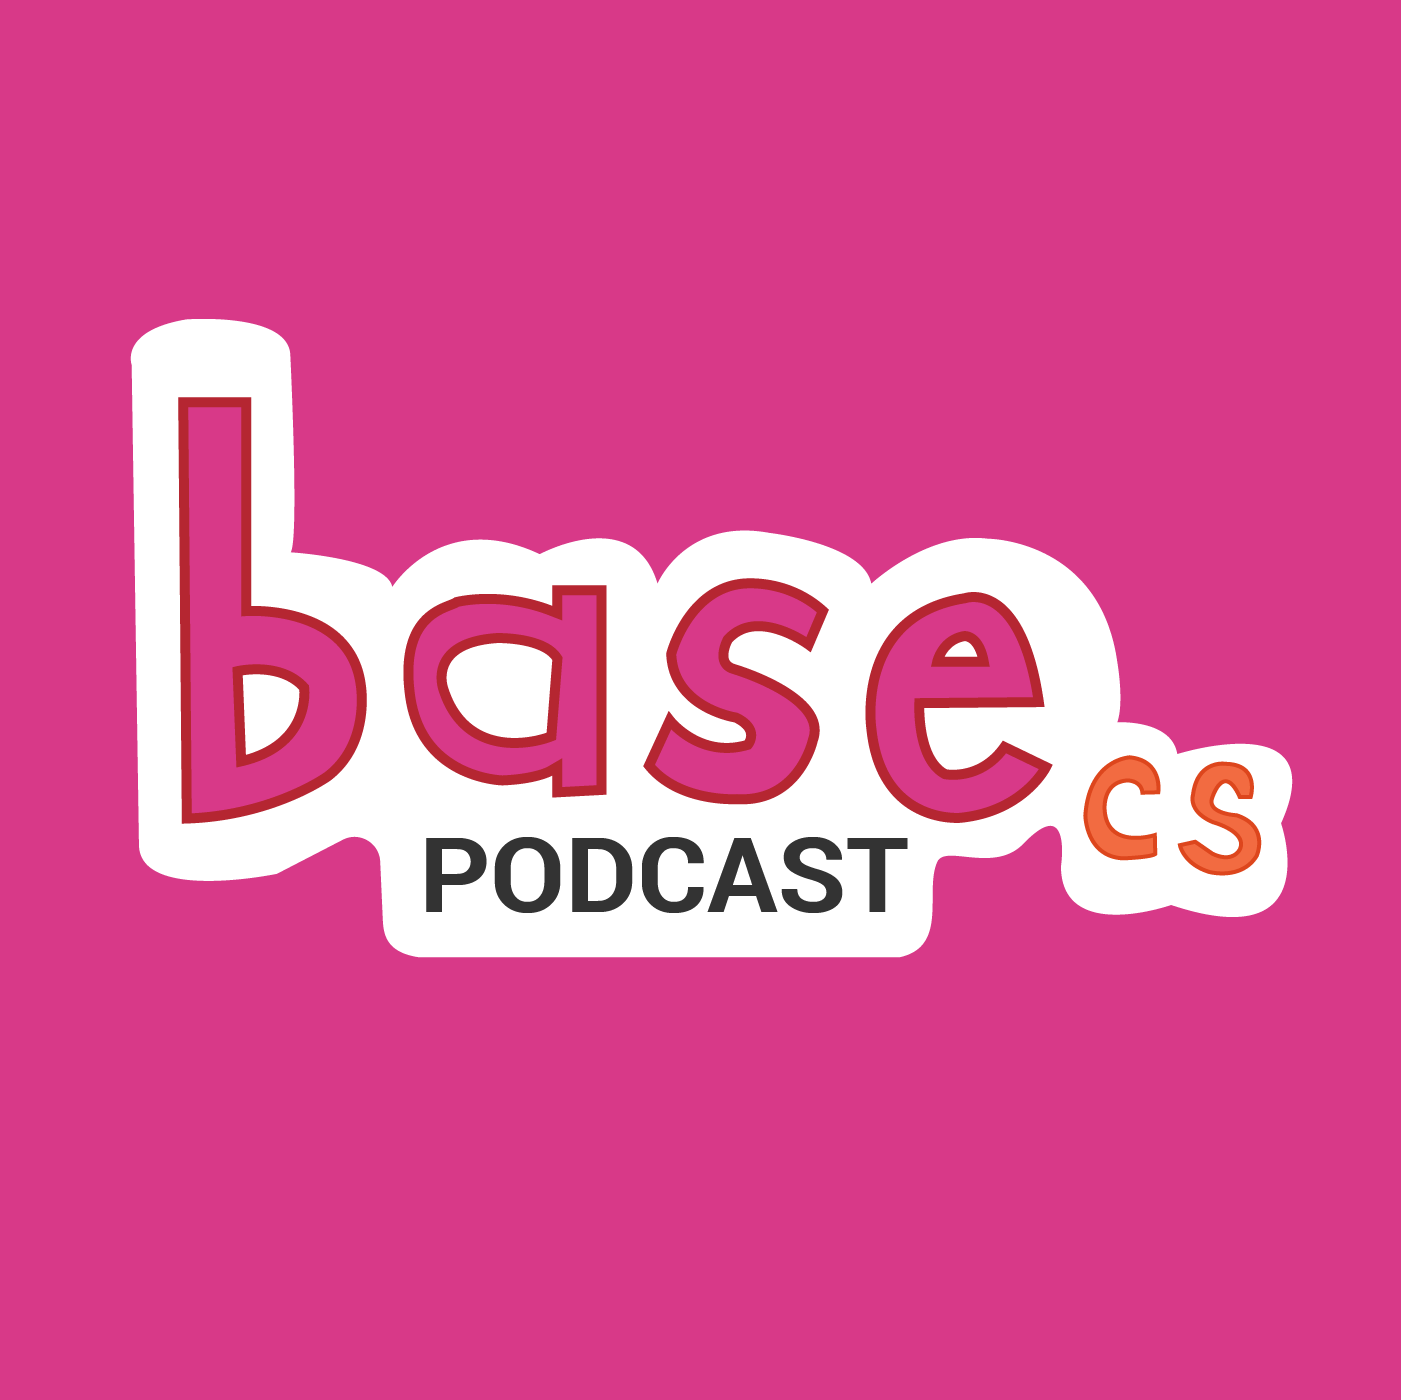 Base.cs Podcast produced by CodeNewbie